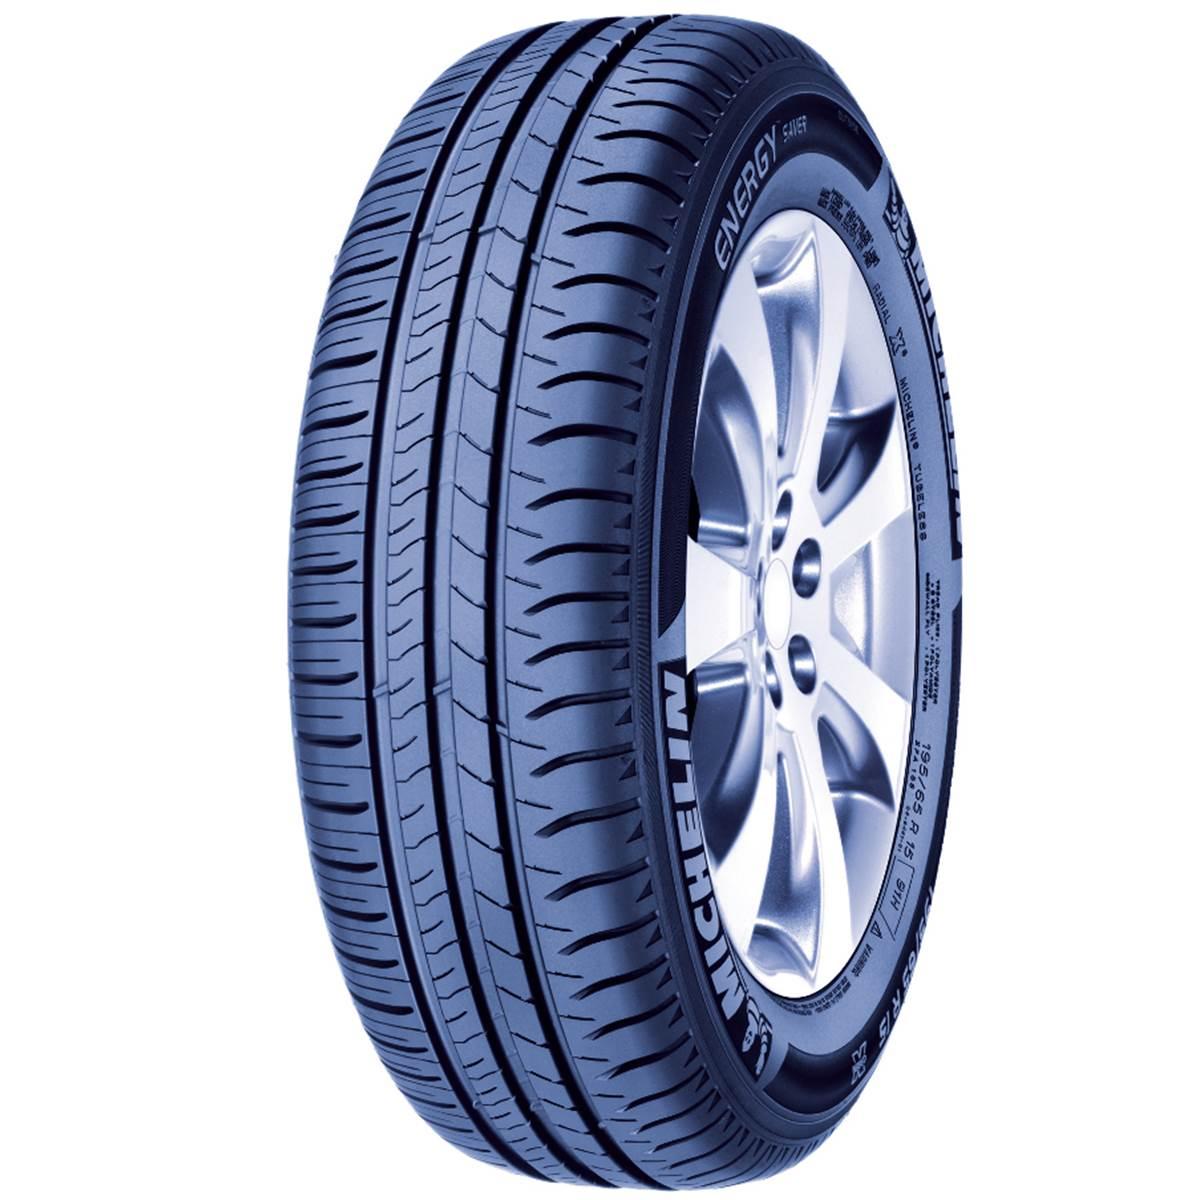 Pneu Michelin 185/55R14 80H Energy Saver